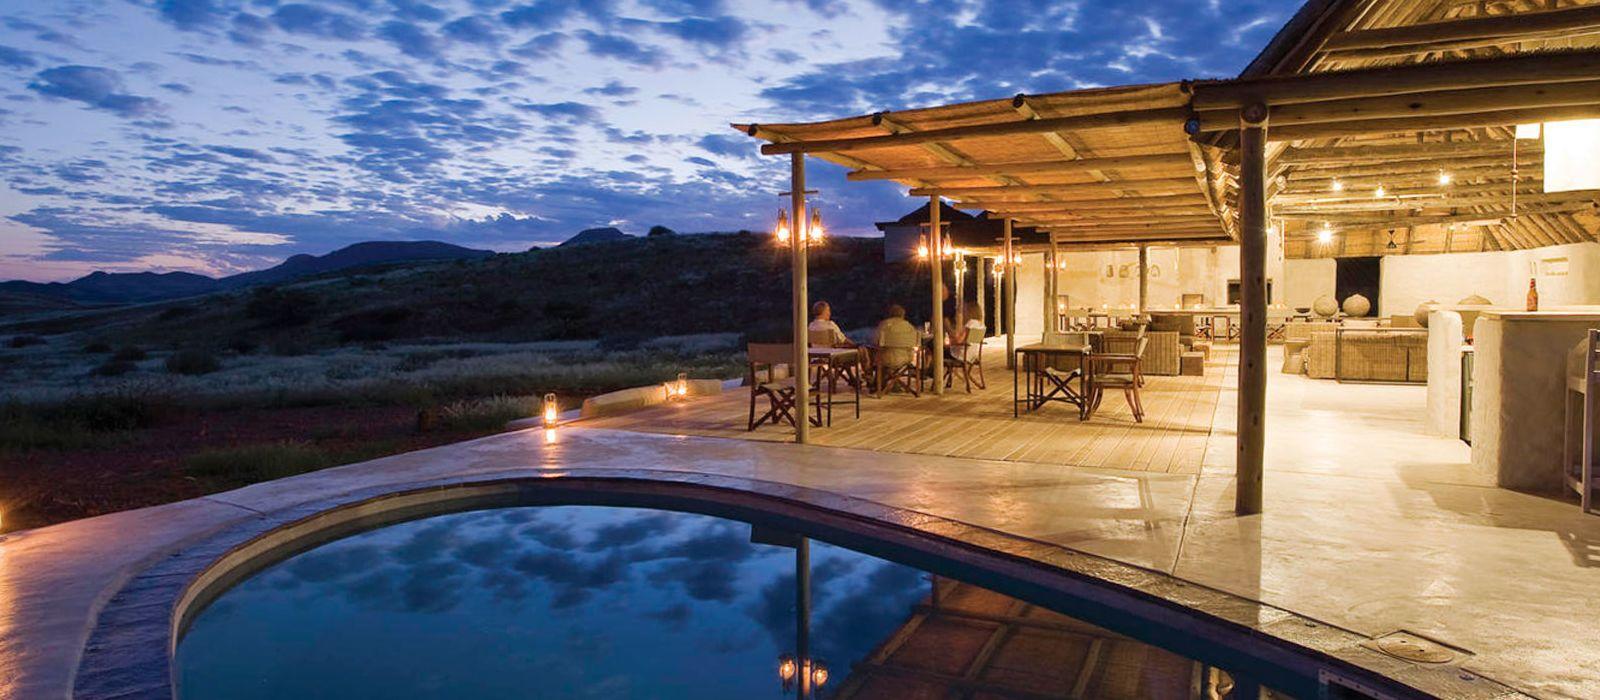 Hotel Damaraland Camp Namibia